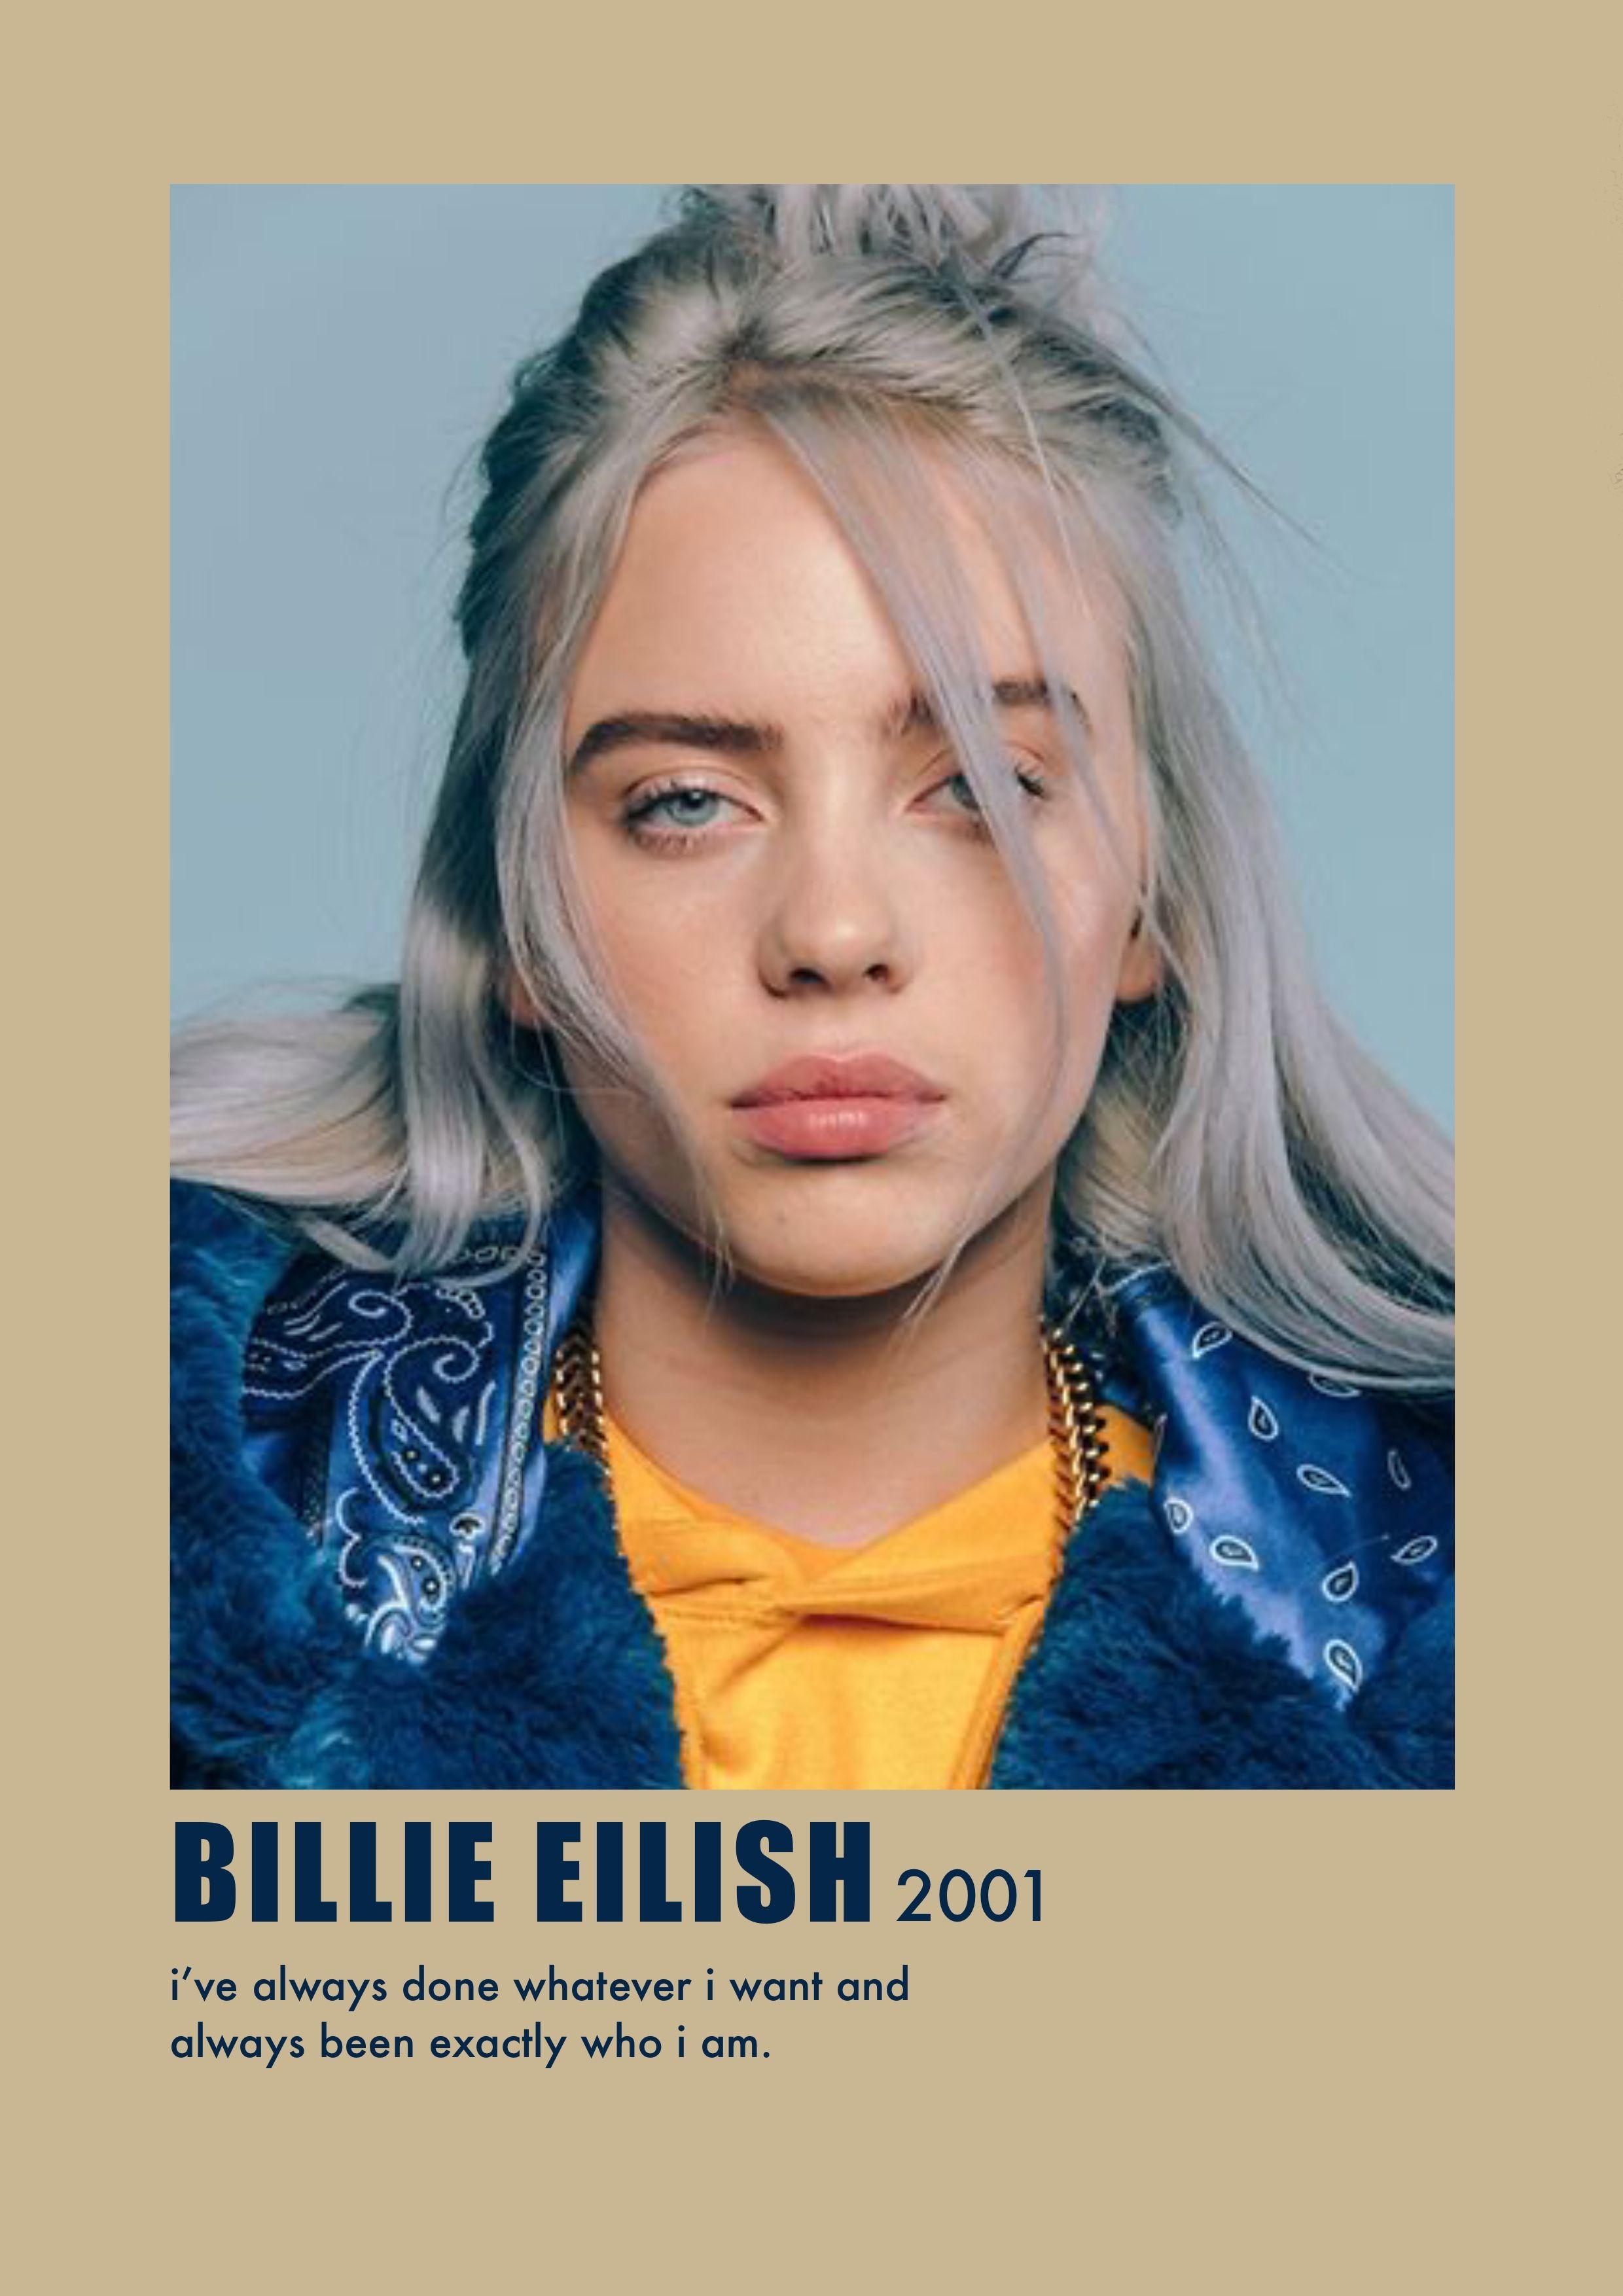 Billie Eilish Poster In 2020 Film Posters Minimalist Movie Posters Minimalist Movie Poster Wall